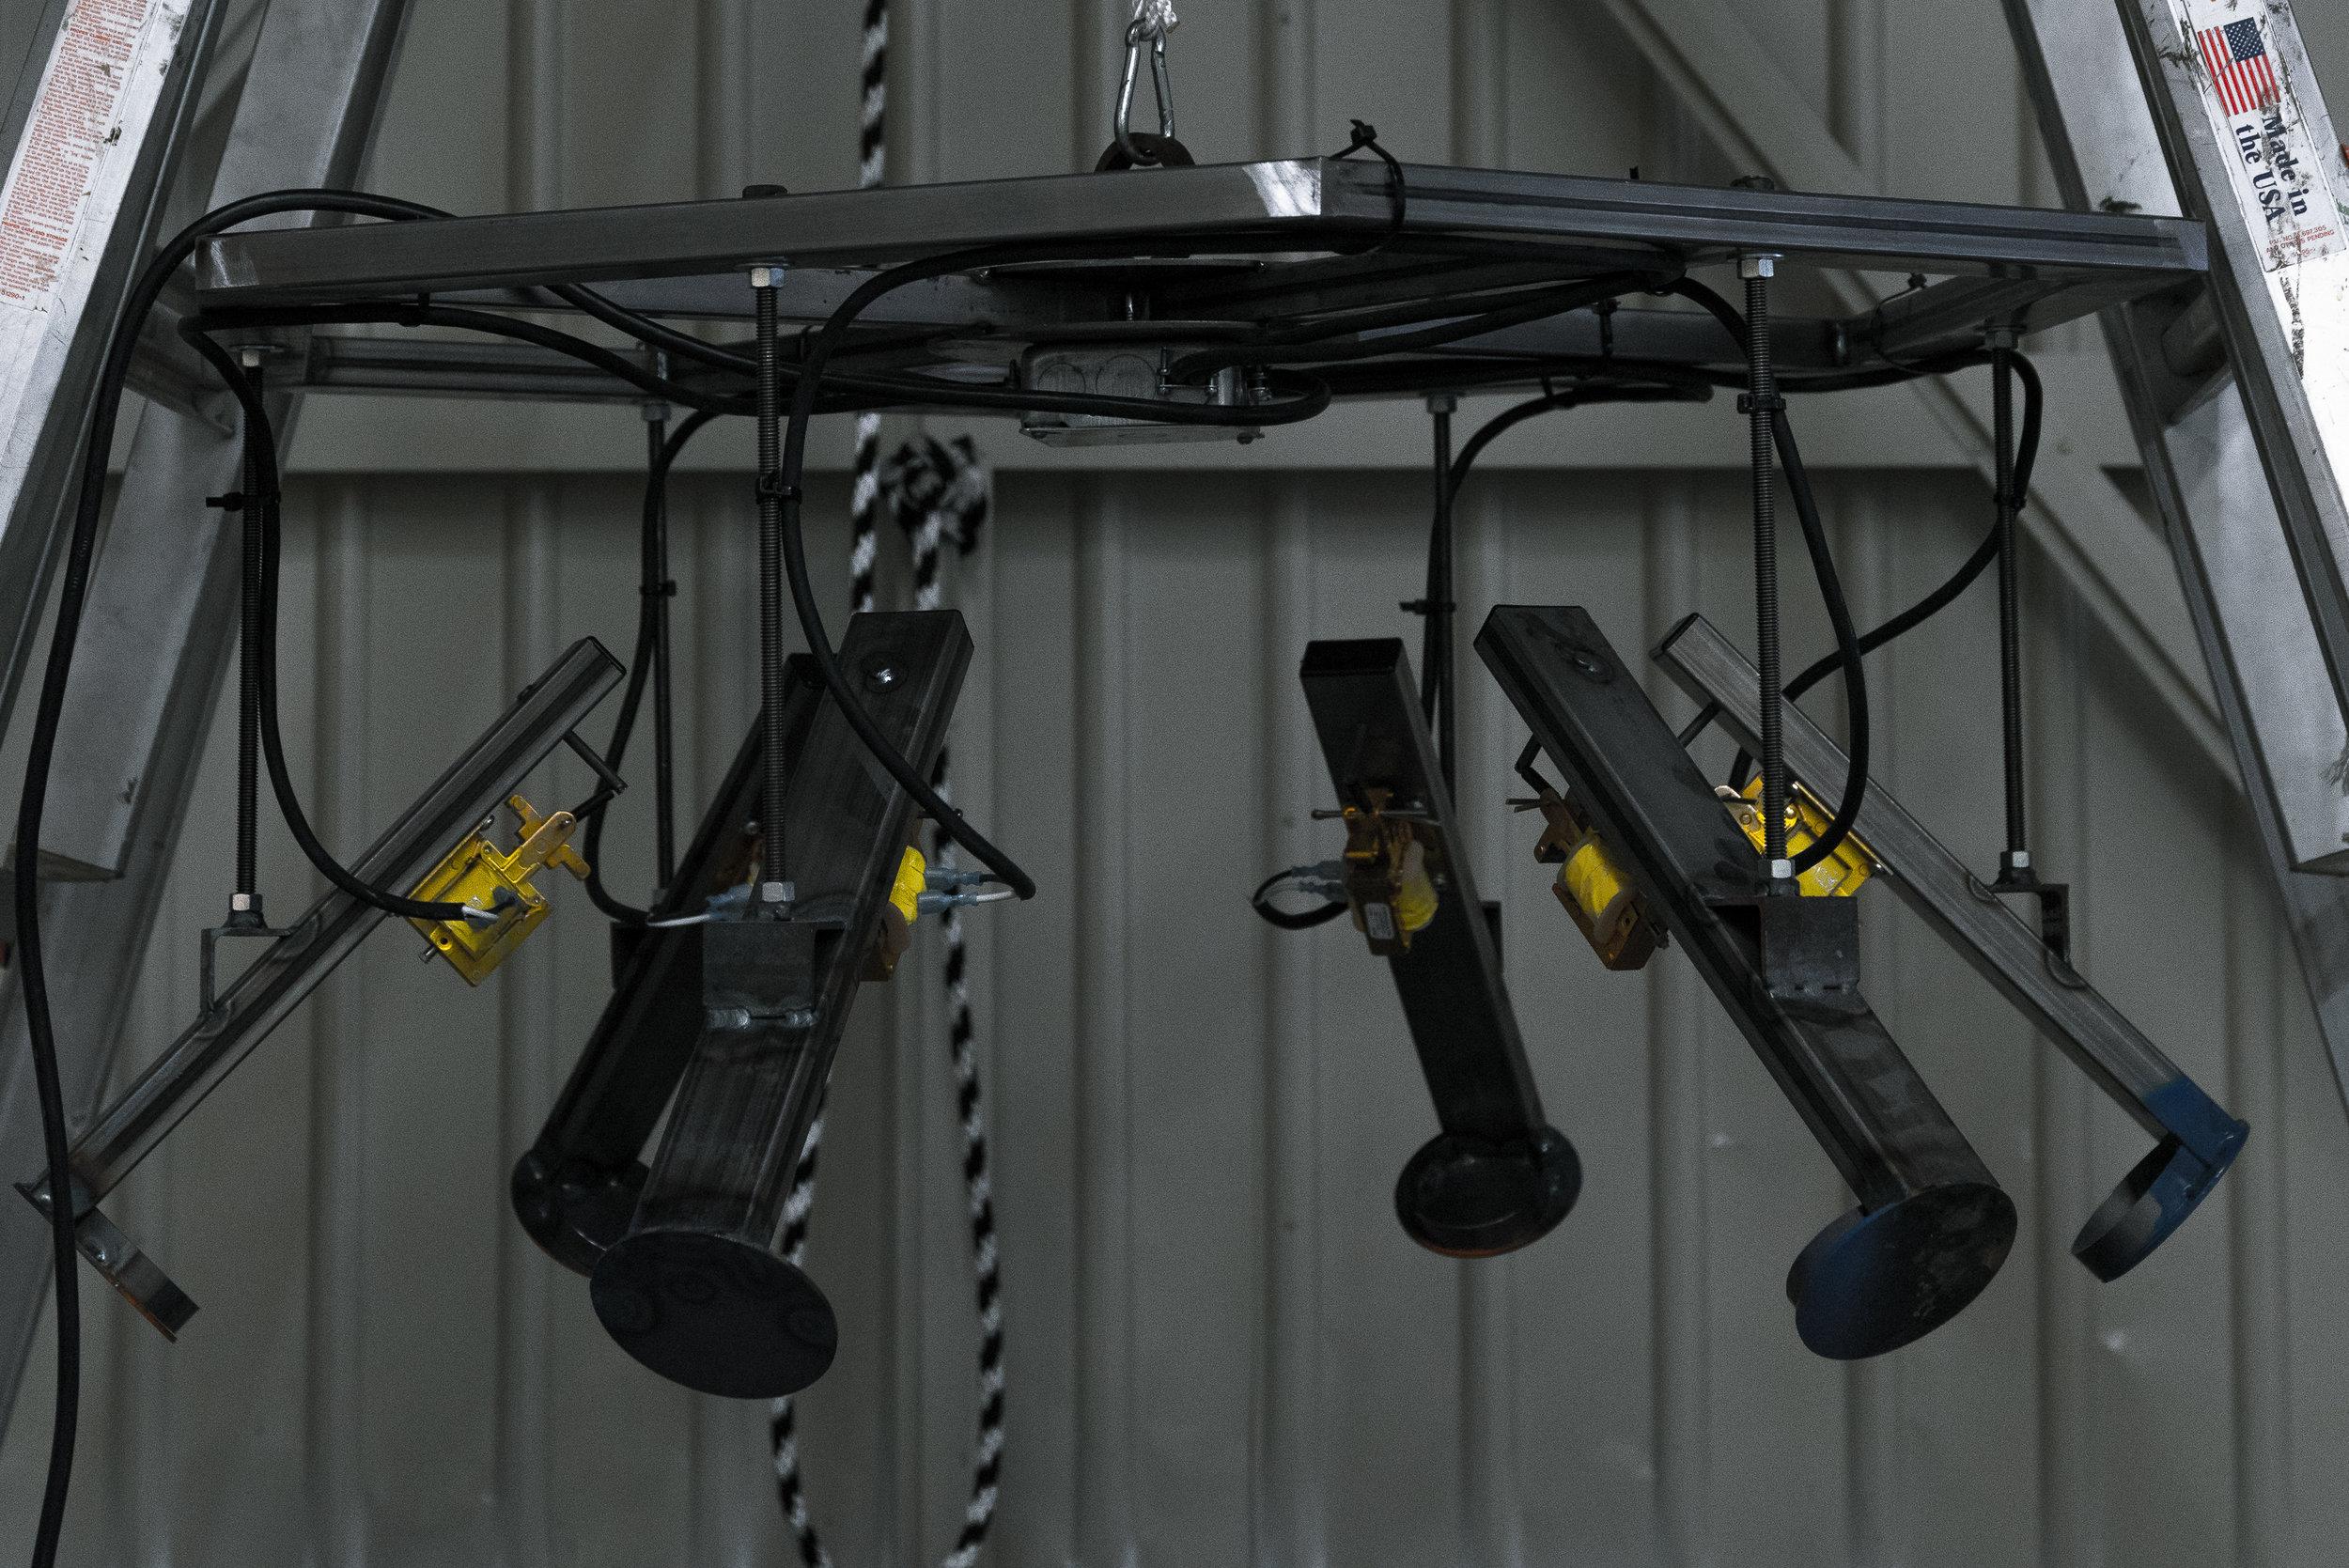 Robotic sprayer system